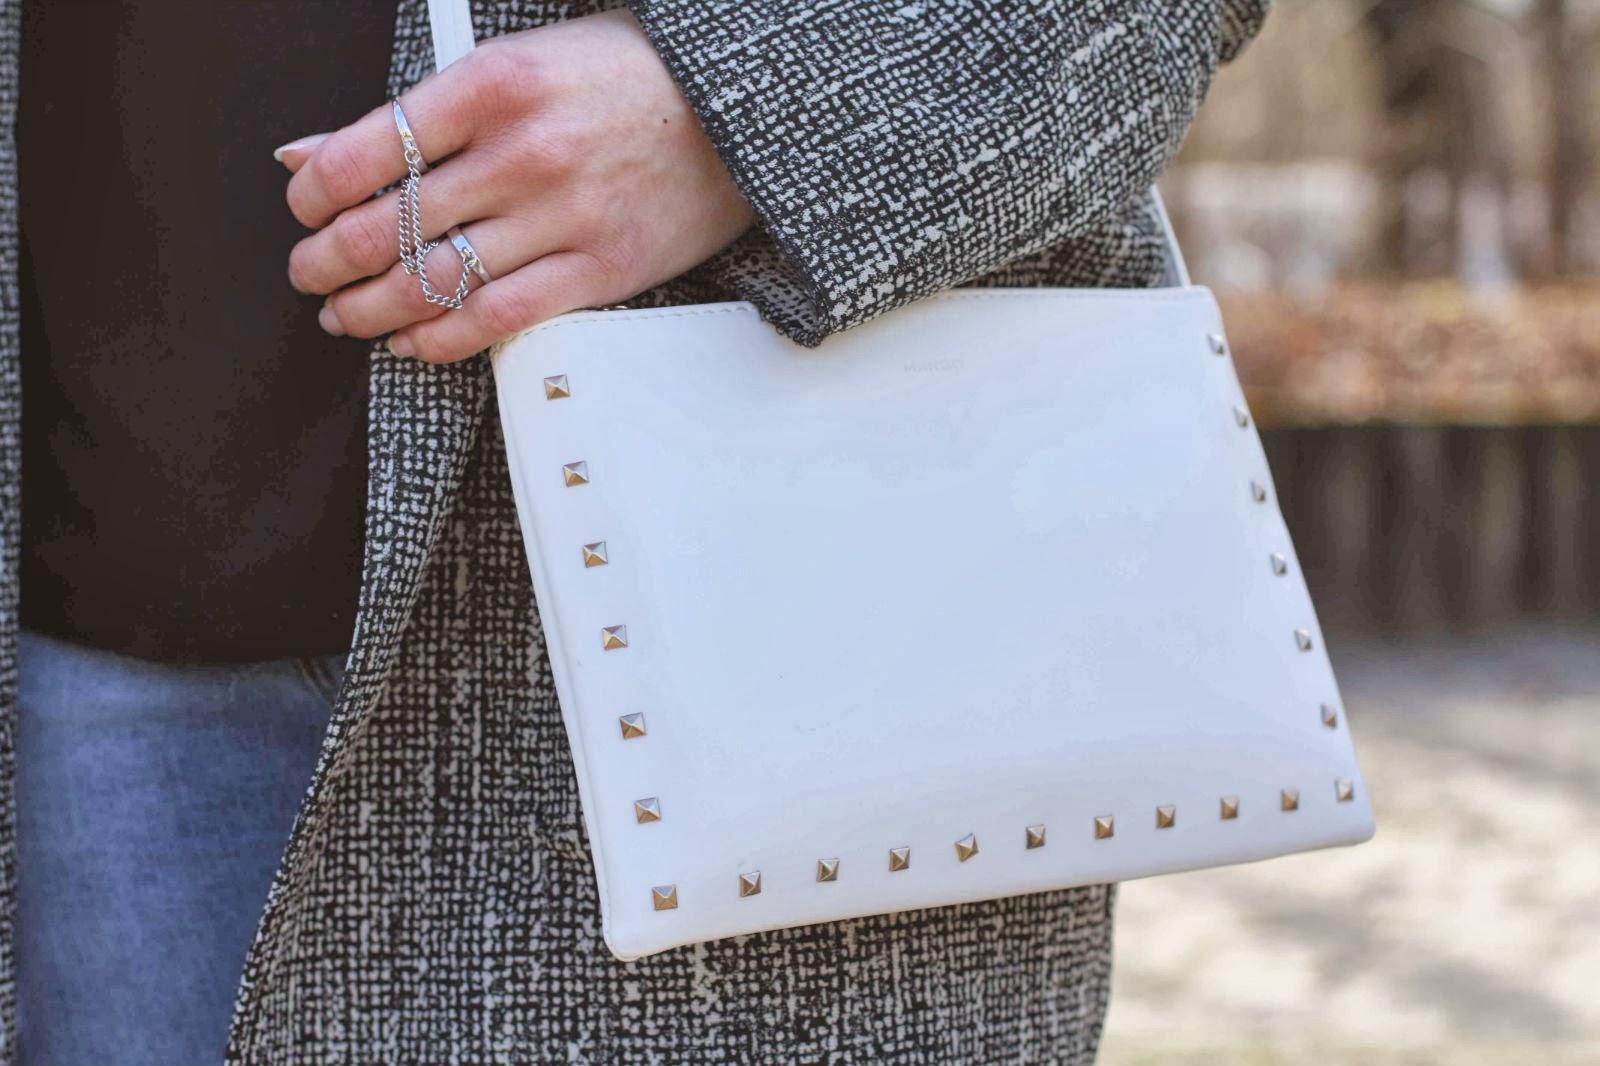 Knuckle Ring, Mango Tasche, Crossbody Bag